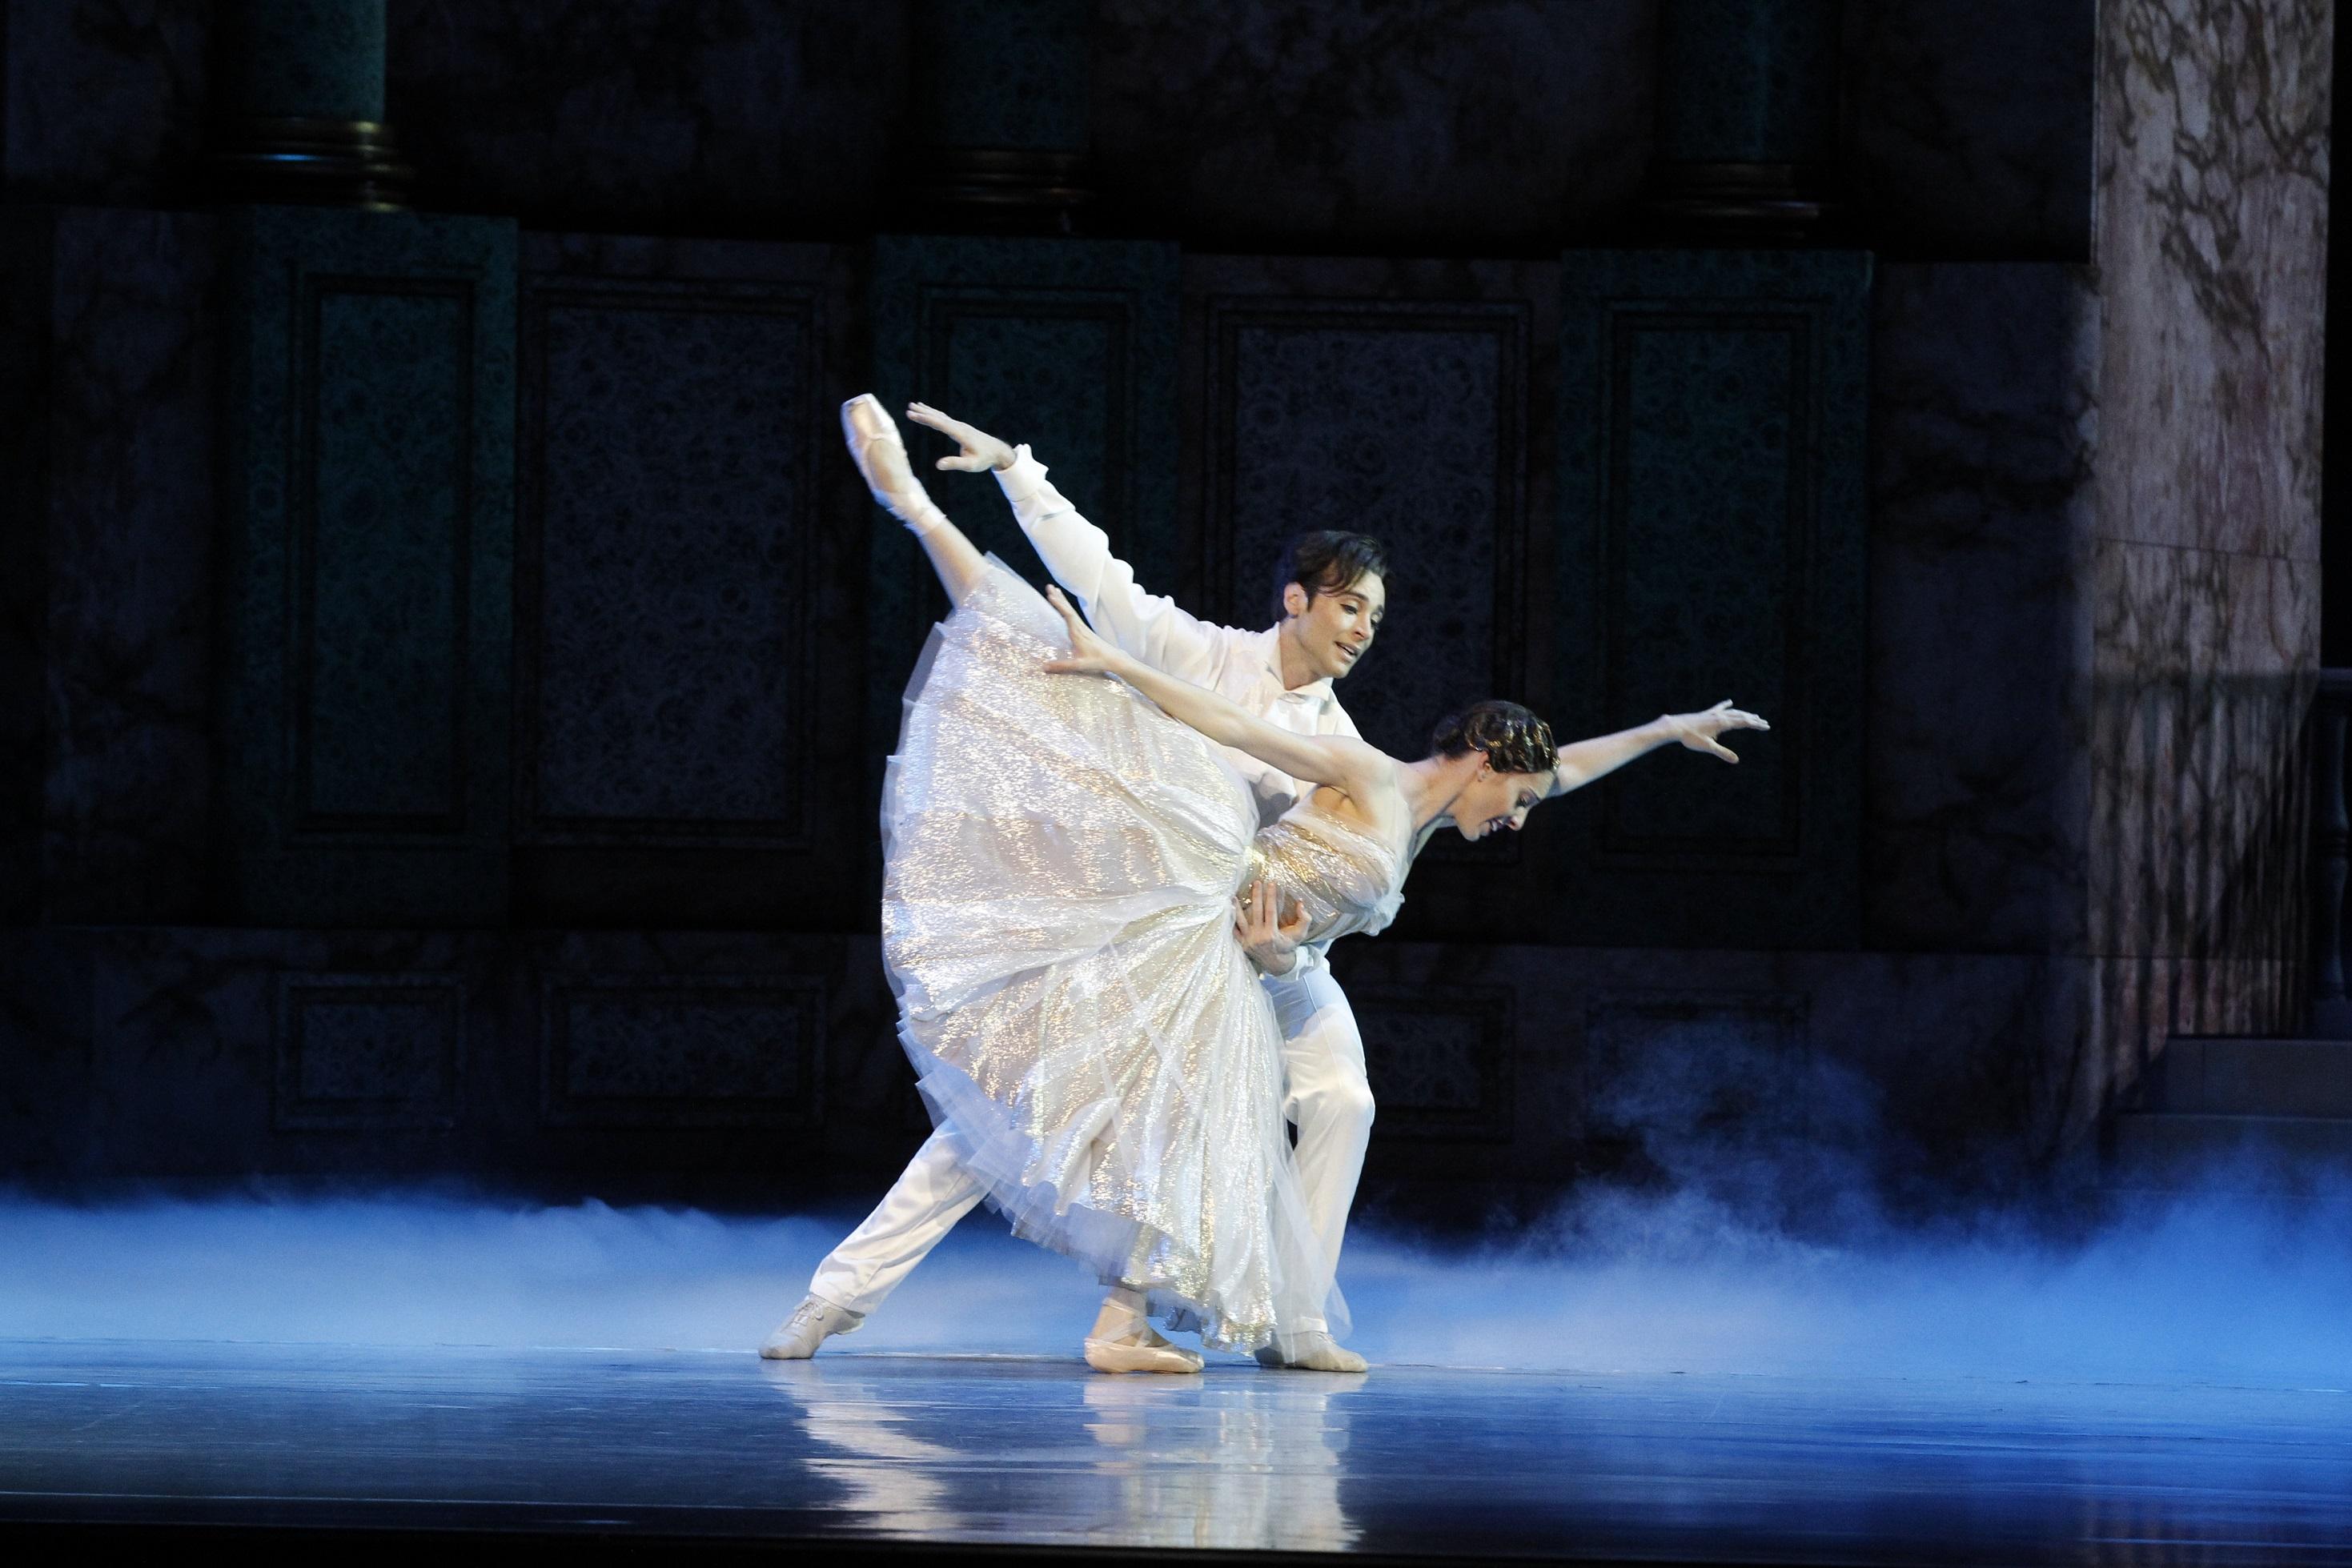 Leanne Stojmenov and Daniel Gaudiello in Cinderella, 2013 photo Jeff Busby_3765